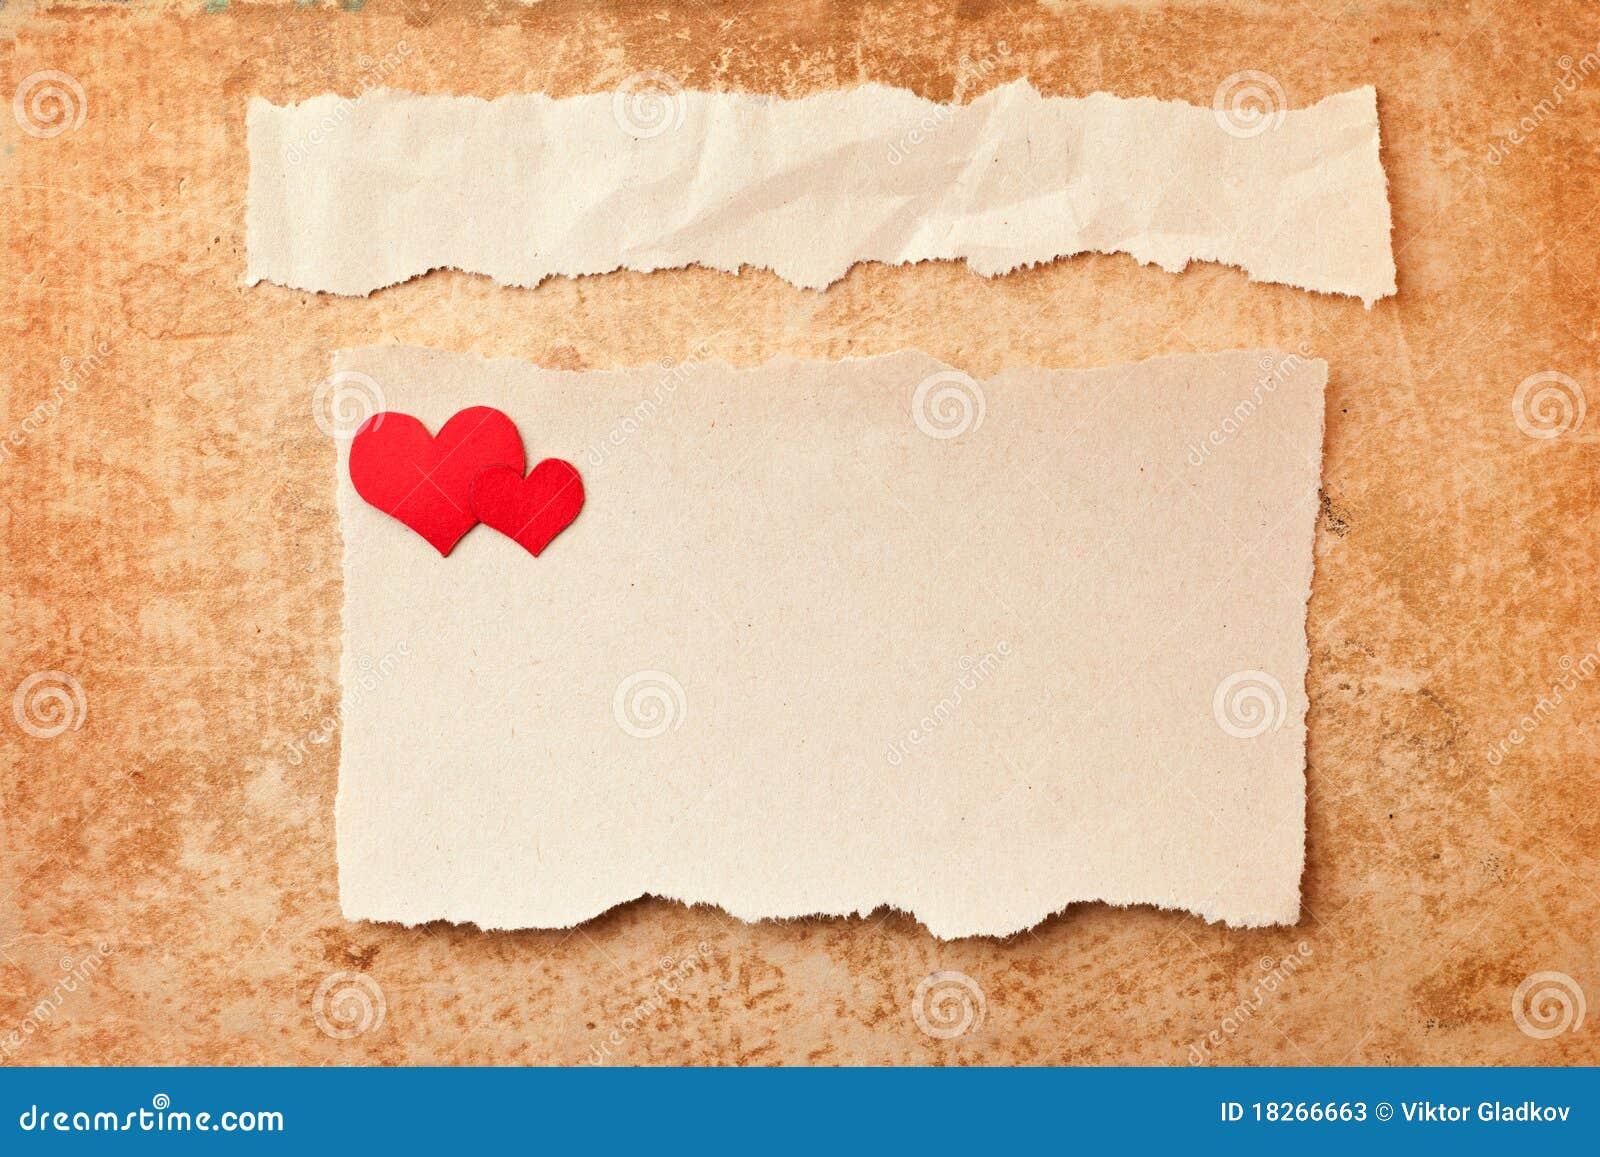 Romantic Powerpoint Templates